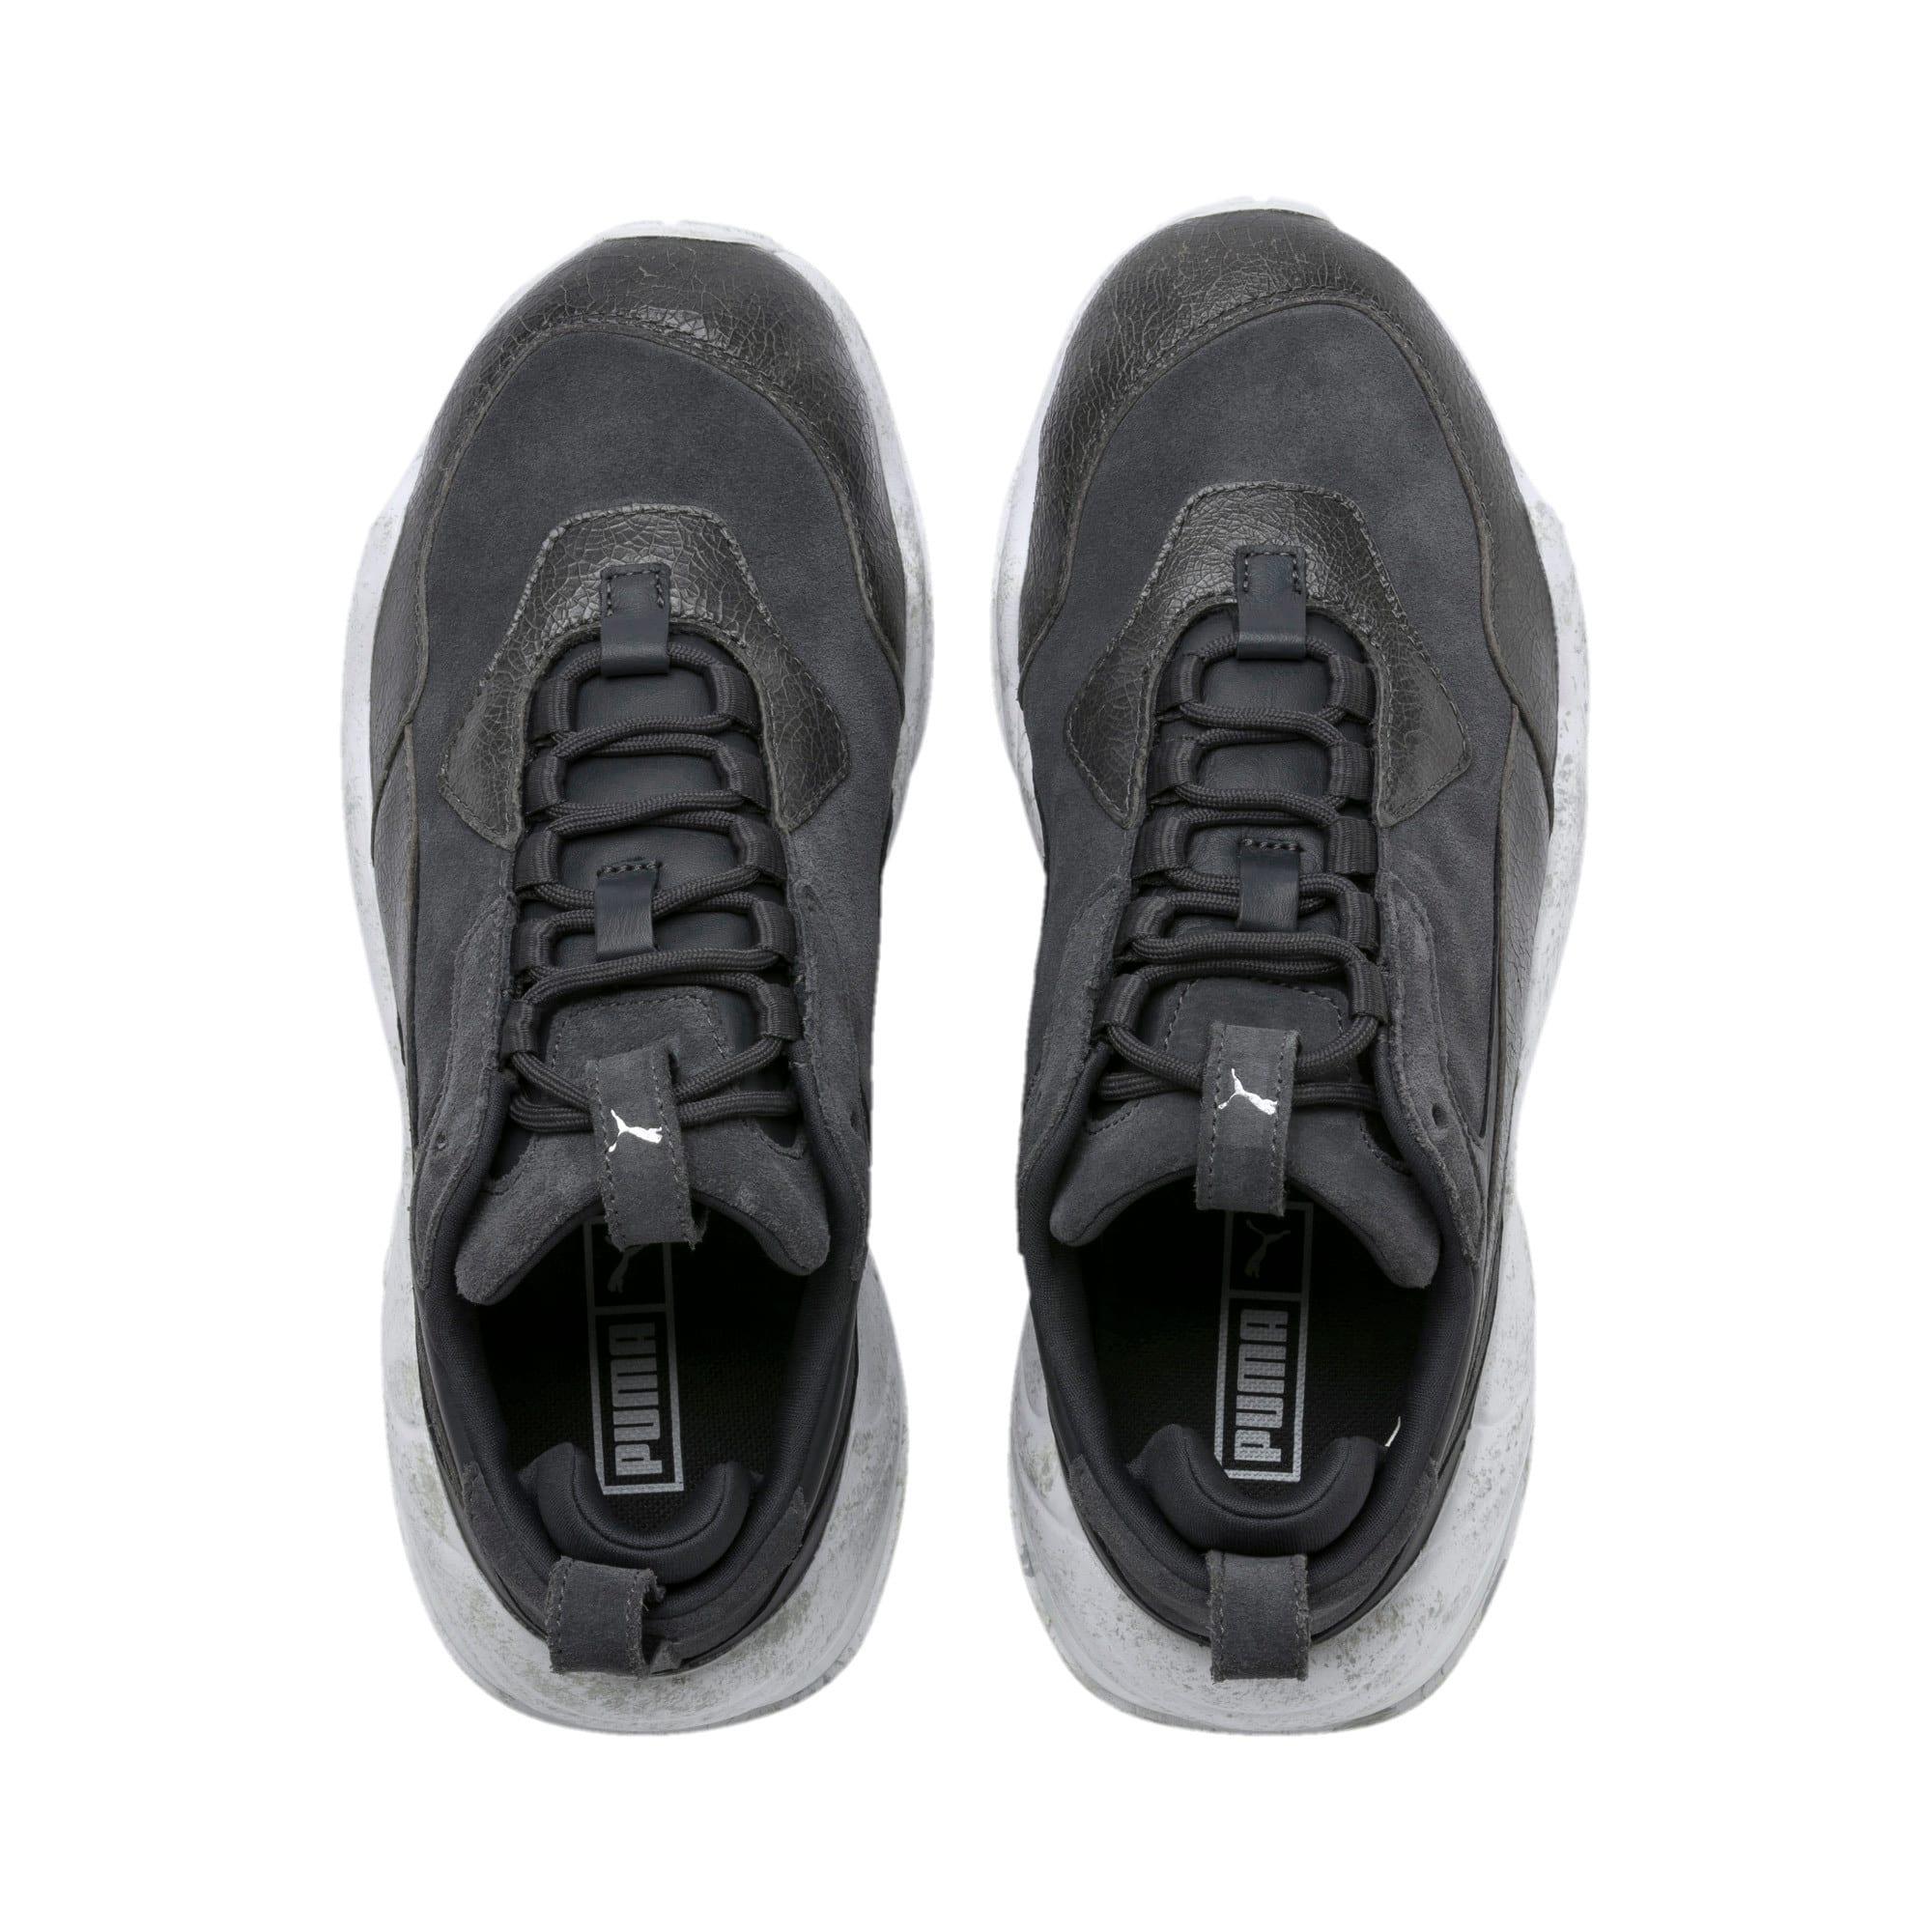 Thumbnail 7 of Thunder Distressed Women's Sneakers, Ebony-Puma Silver, medium